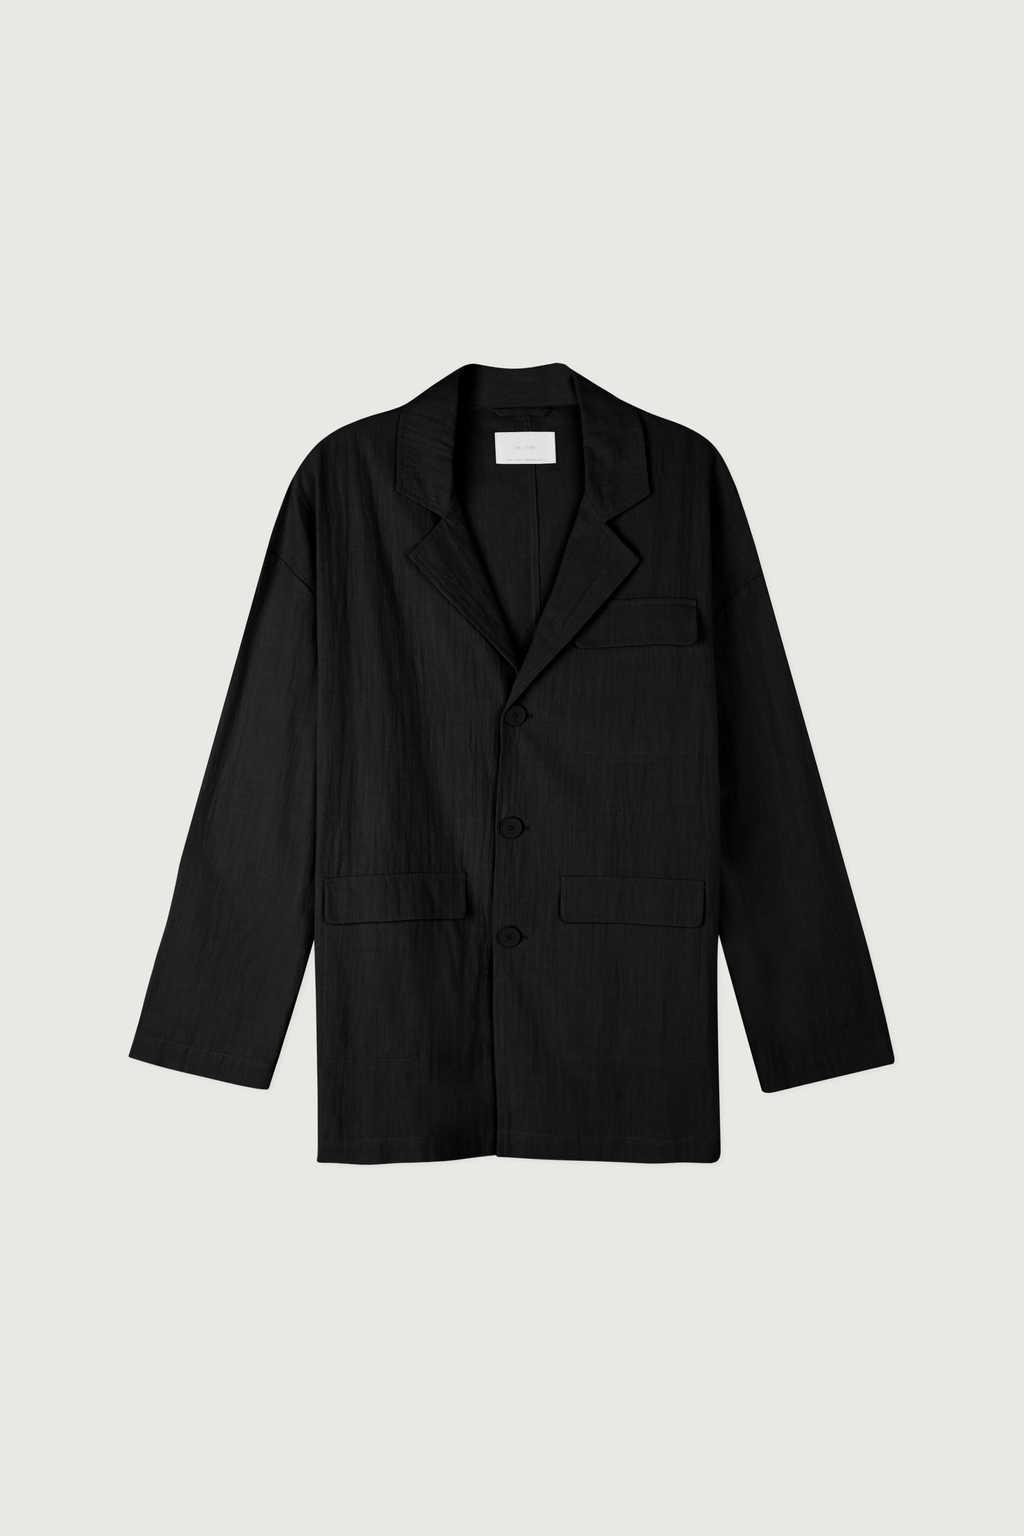 Jacket 3508 Black 11